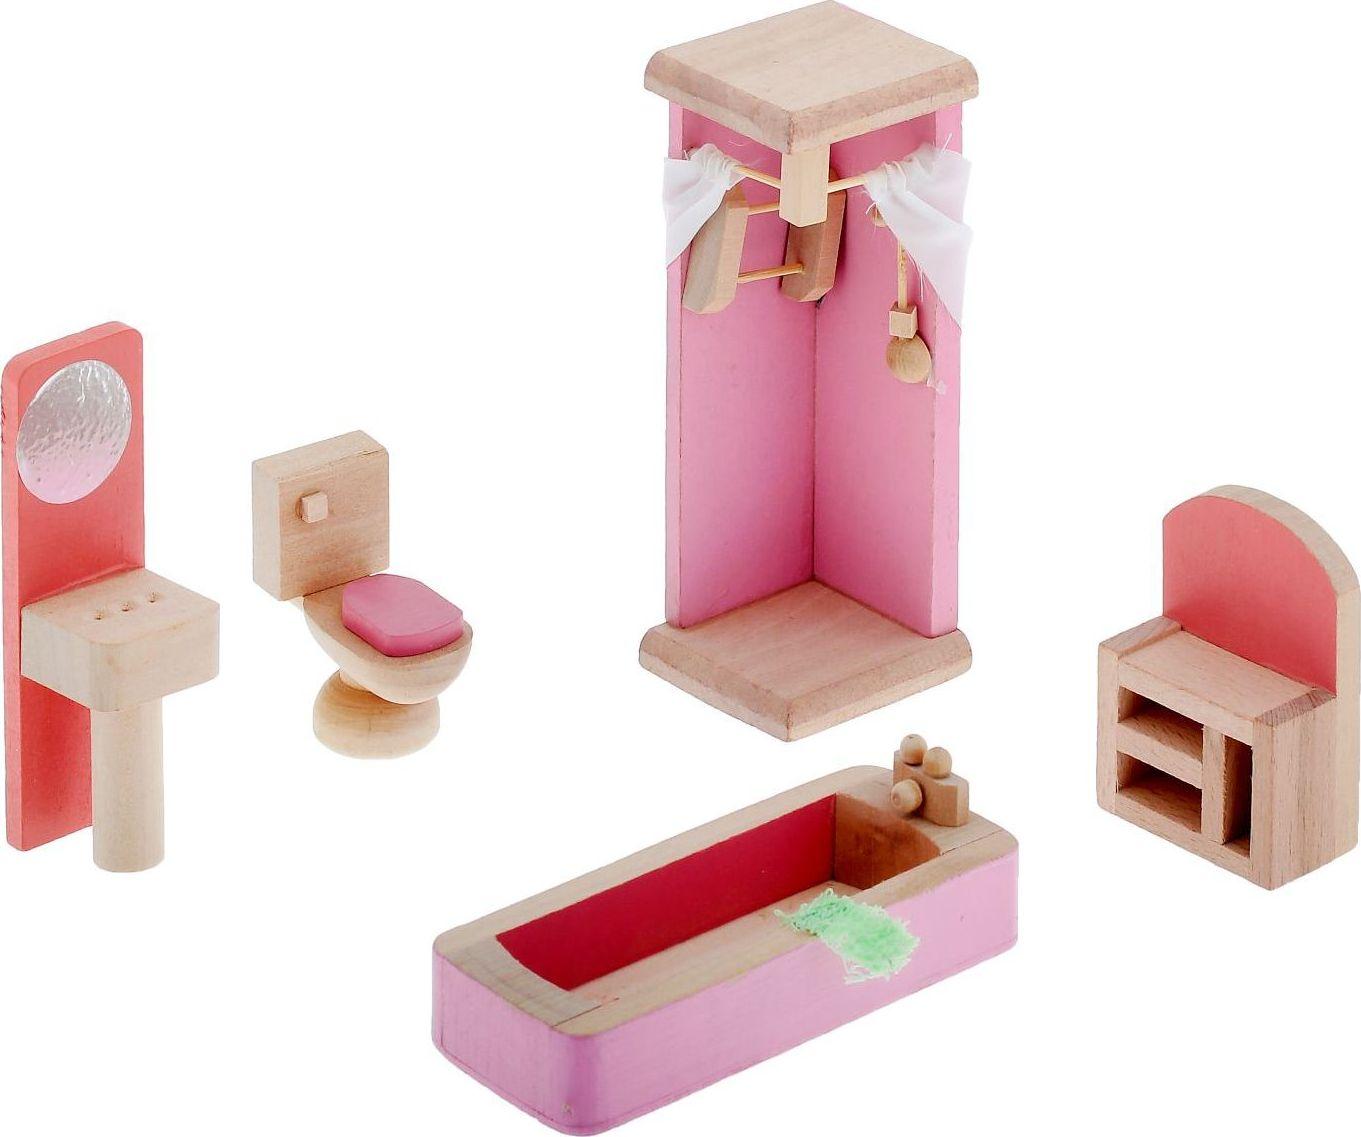 Sima-land Мебель для кукол Ванная комната 5 предметов 730417 куплю квартиру 2 х комнатную братск